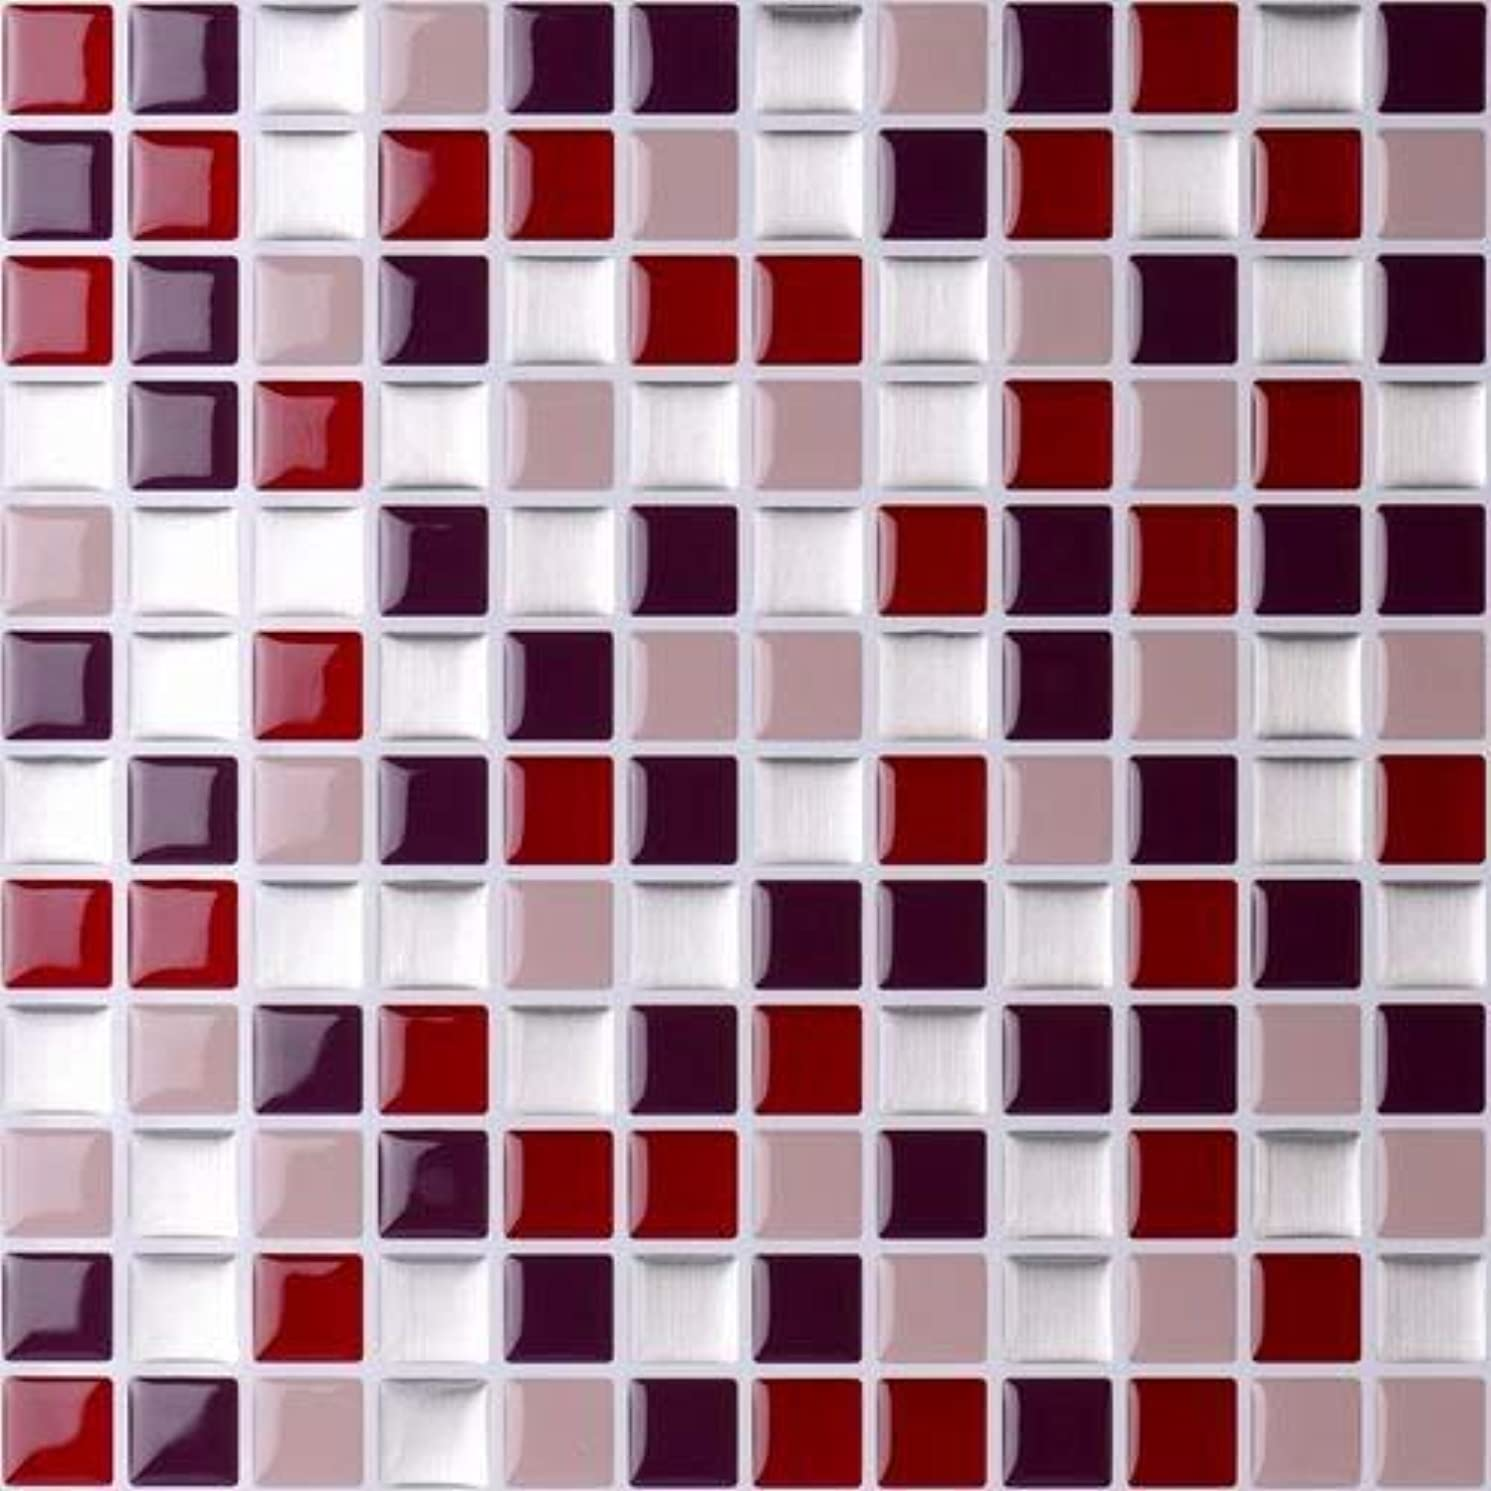 Vamos Tile Premium Anti Mold Peel and Stick Tile Backsplash,Self Adhesive Wall Tiles for Kitchen & Bathroom-10 x 9